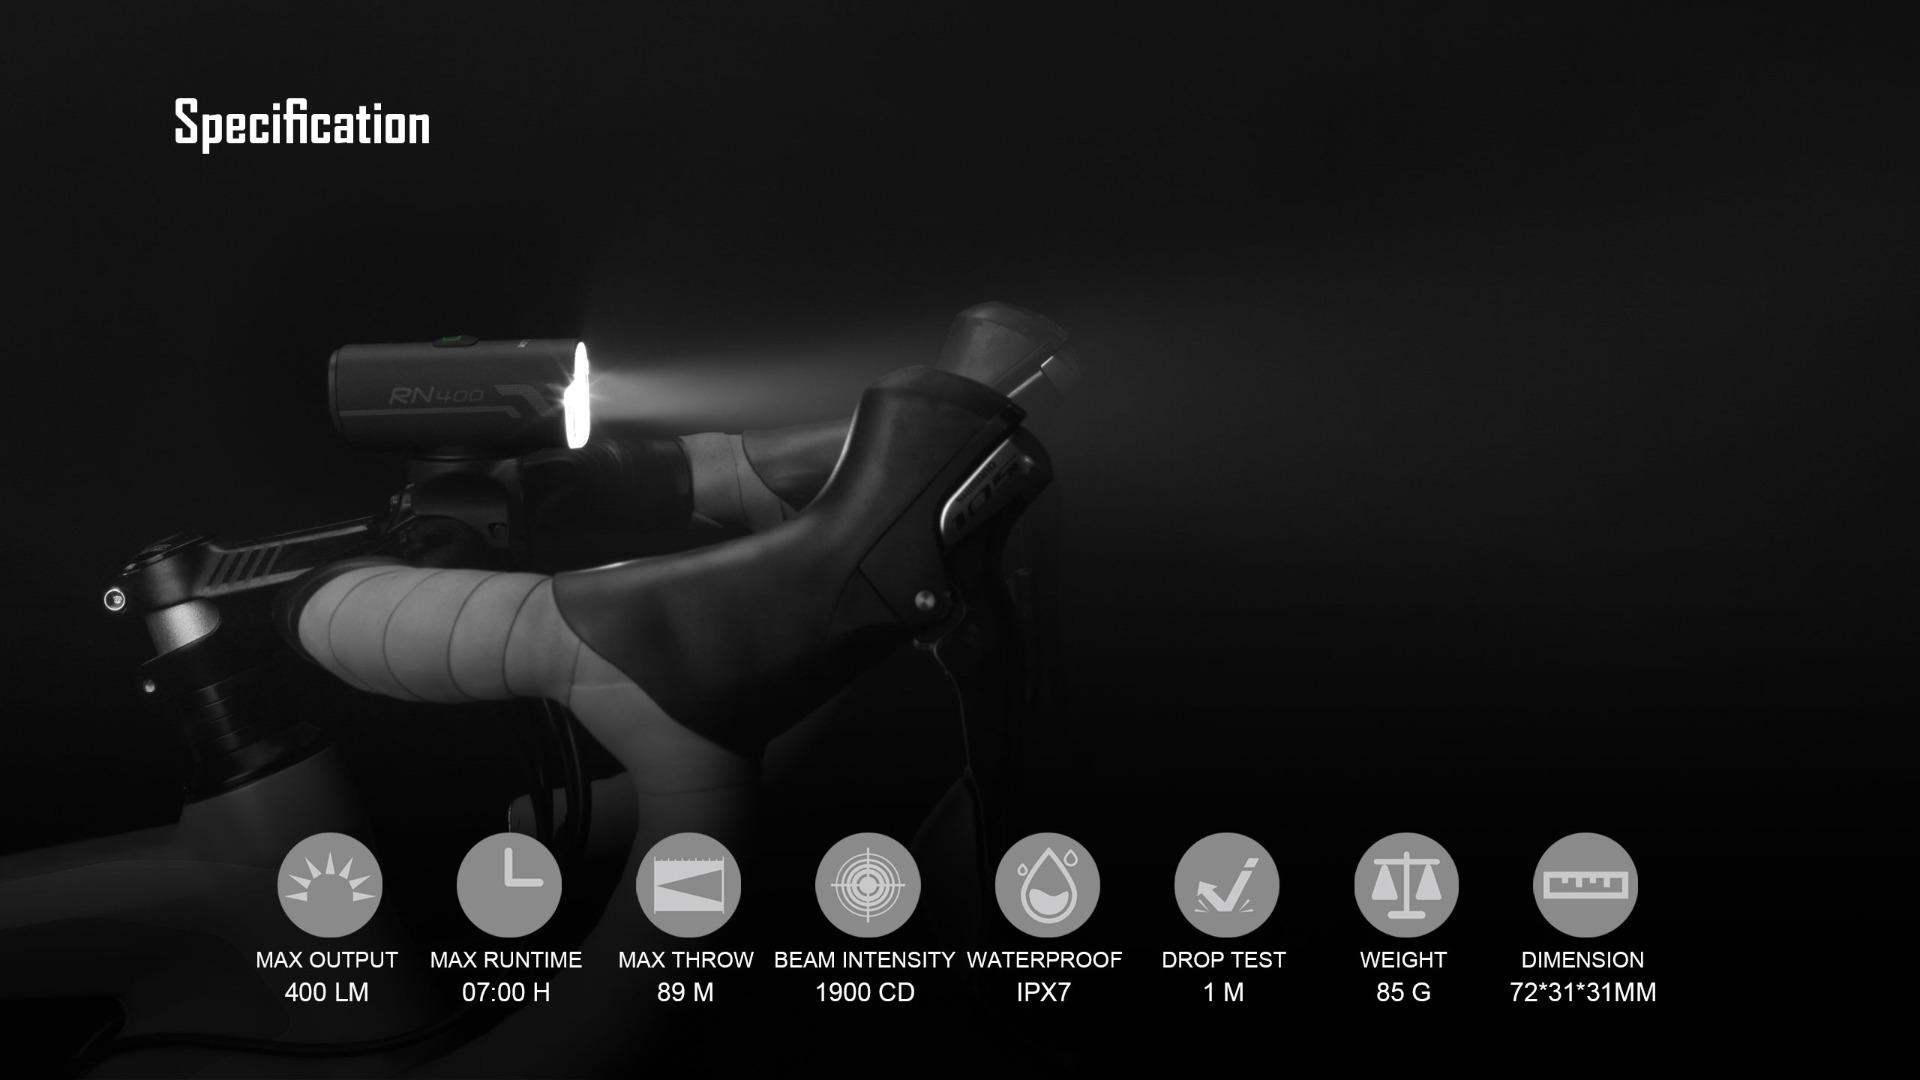 Olight RN 400 Bike LED Light Headlight Specification